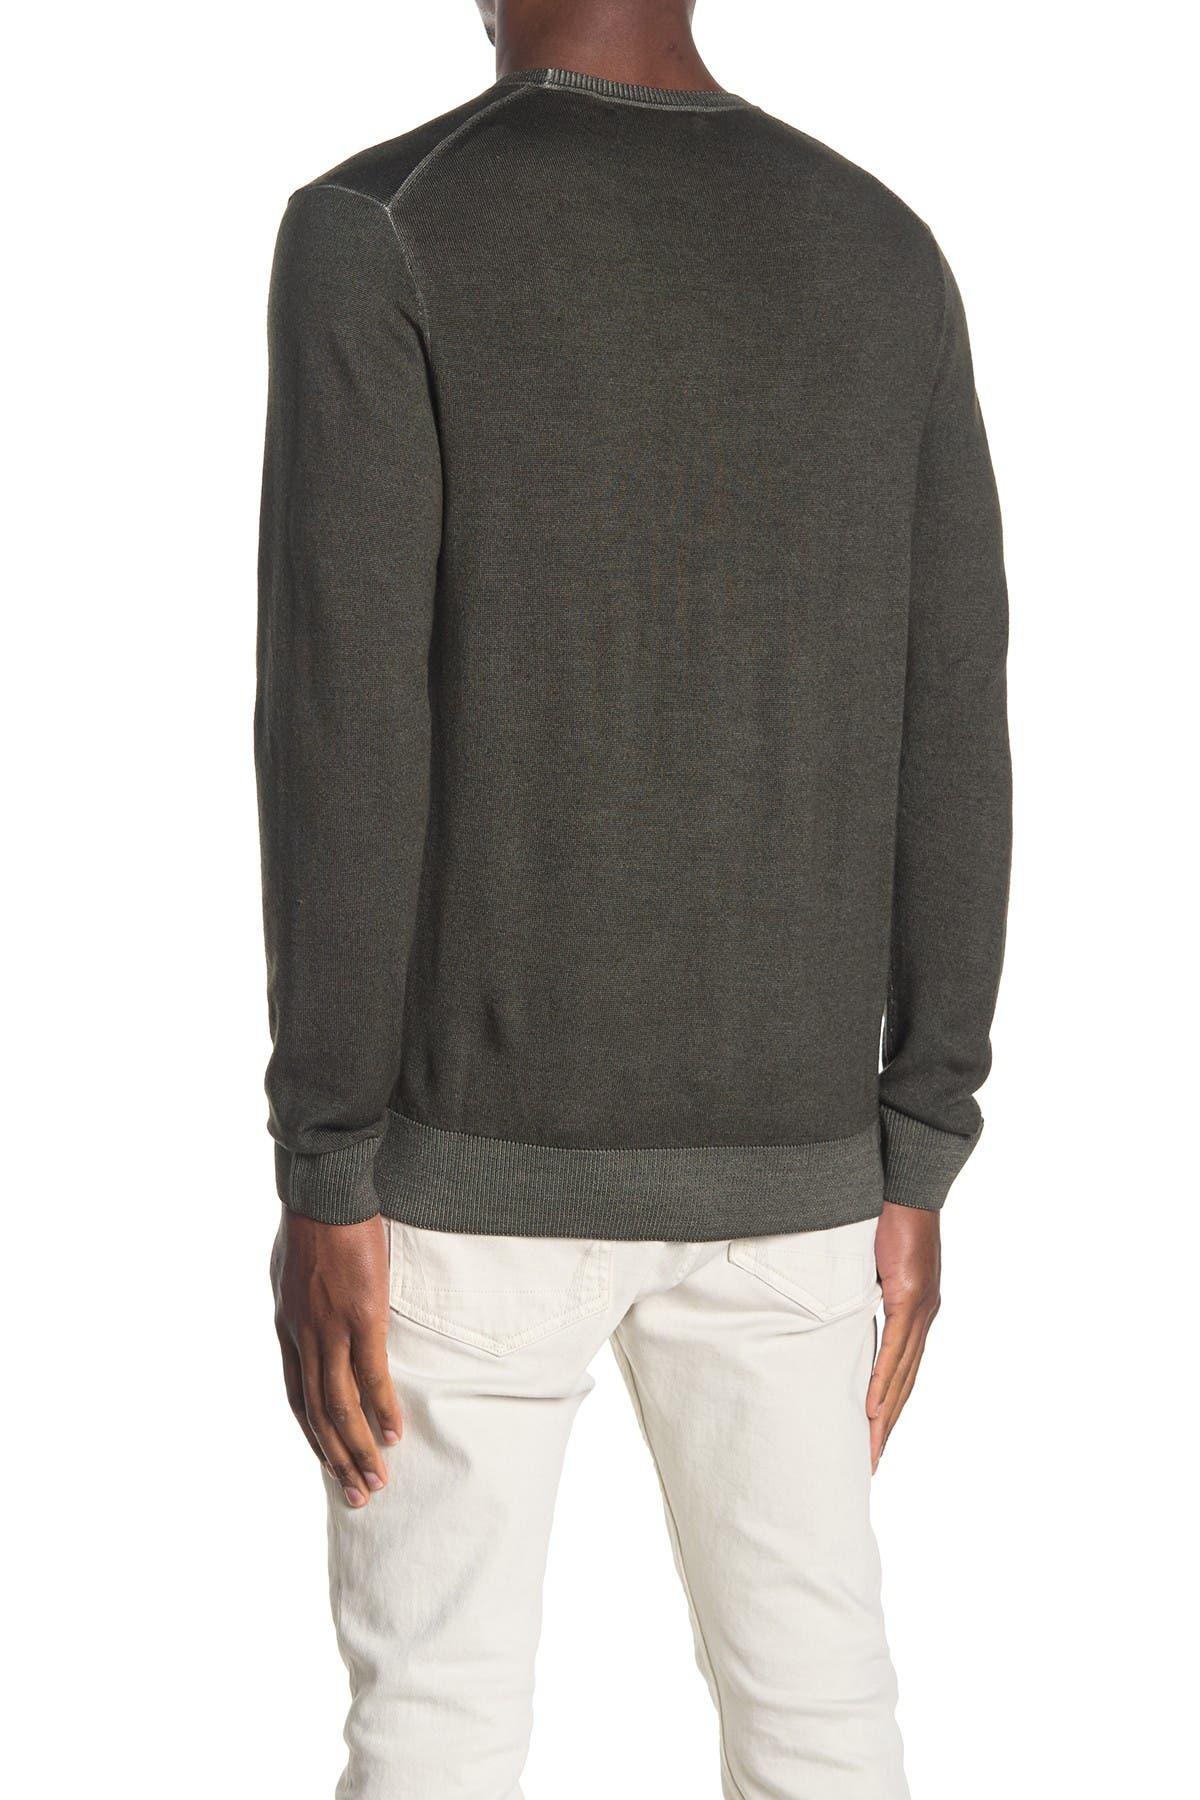 Image of Michael Kors Merino Wool Crew Neck Sweater